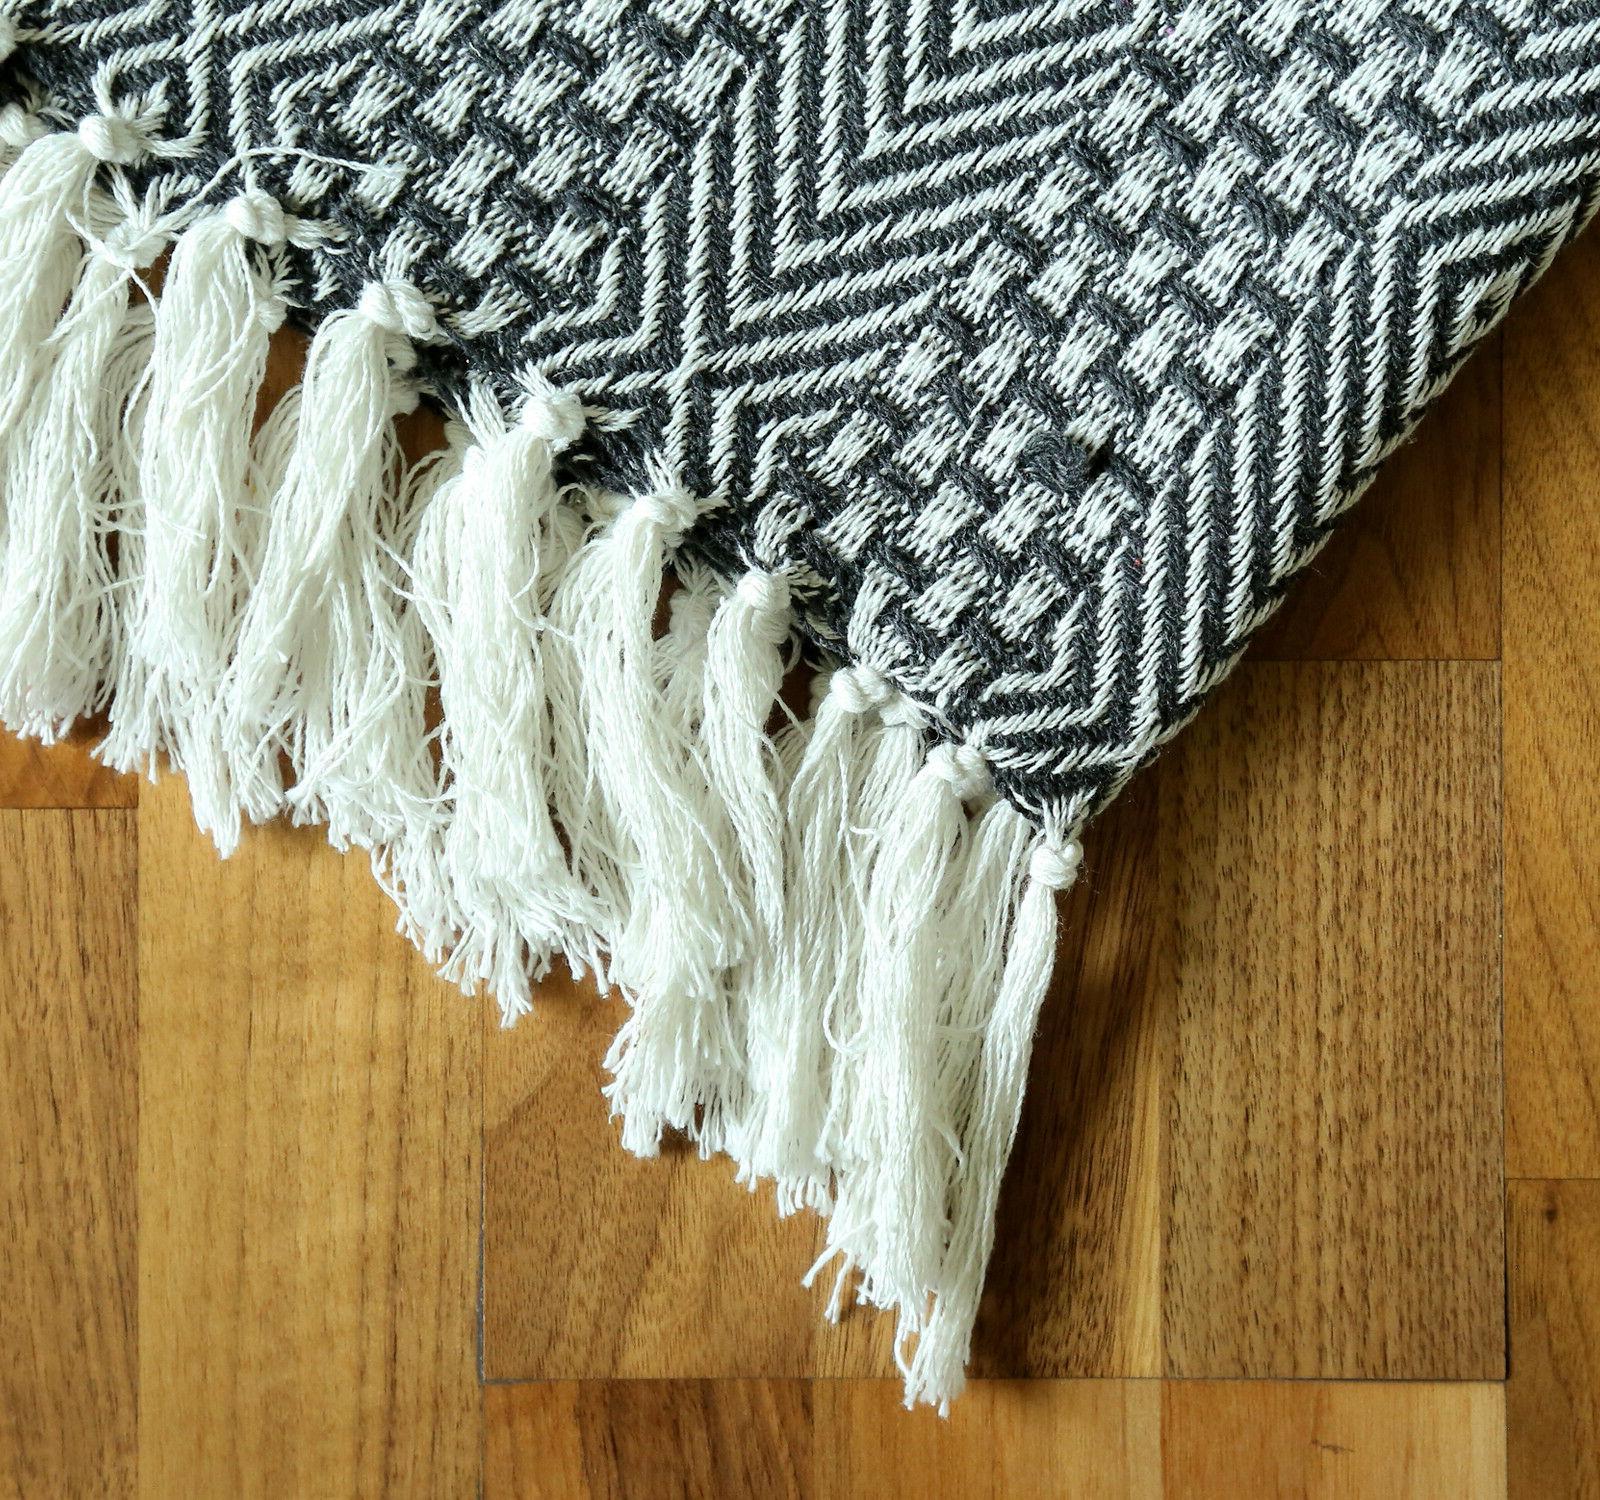 Woven Warm Blanket 50 x 60